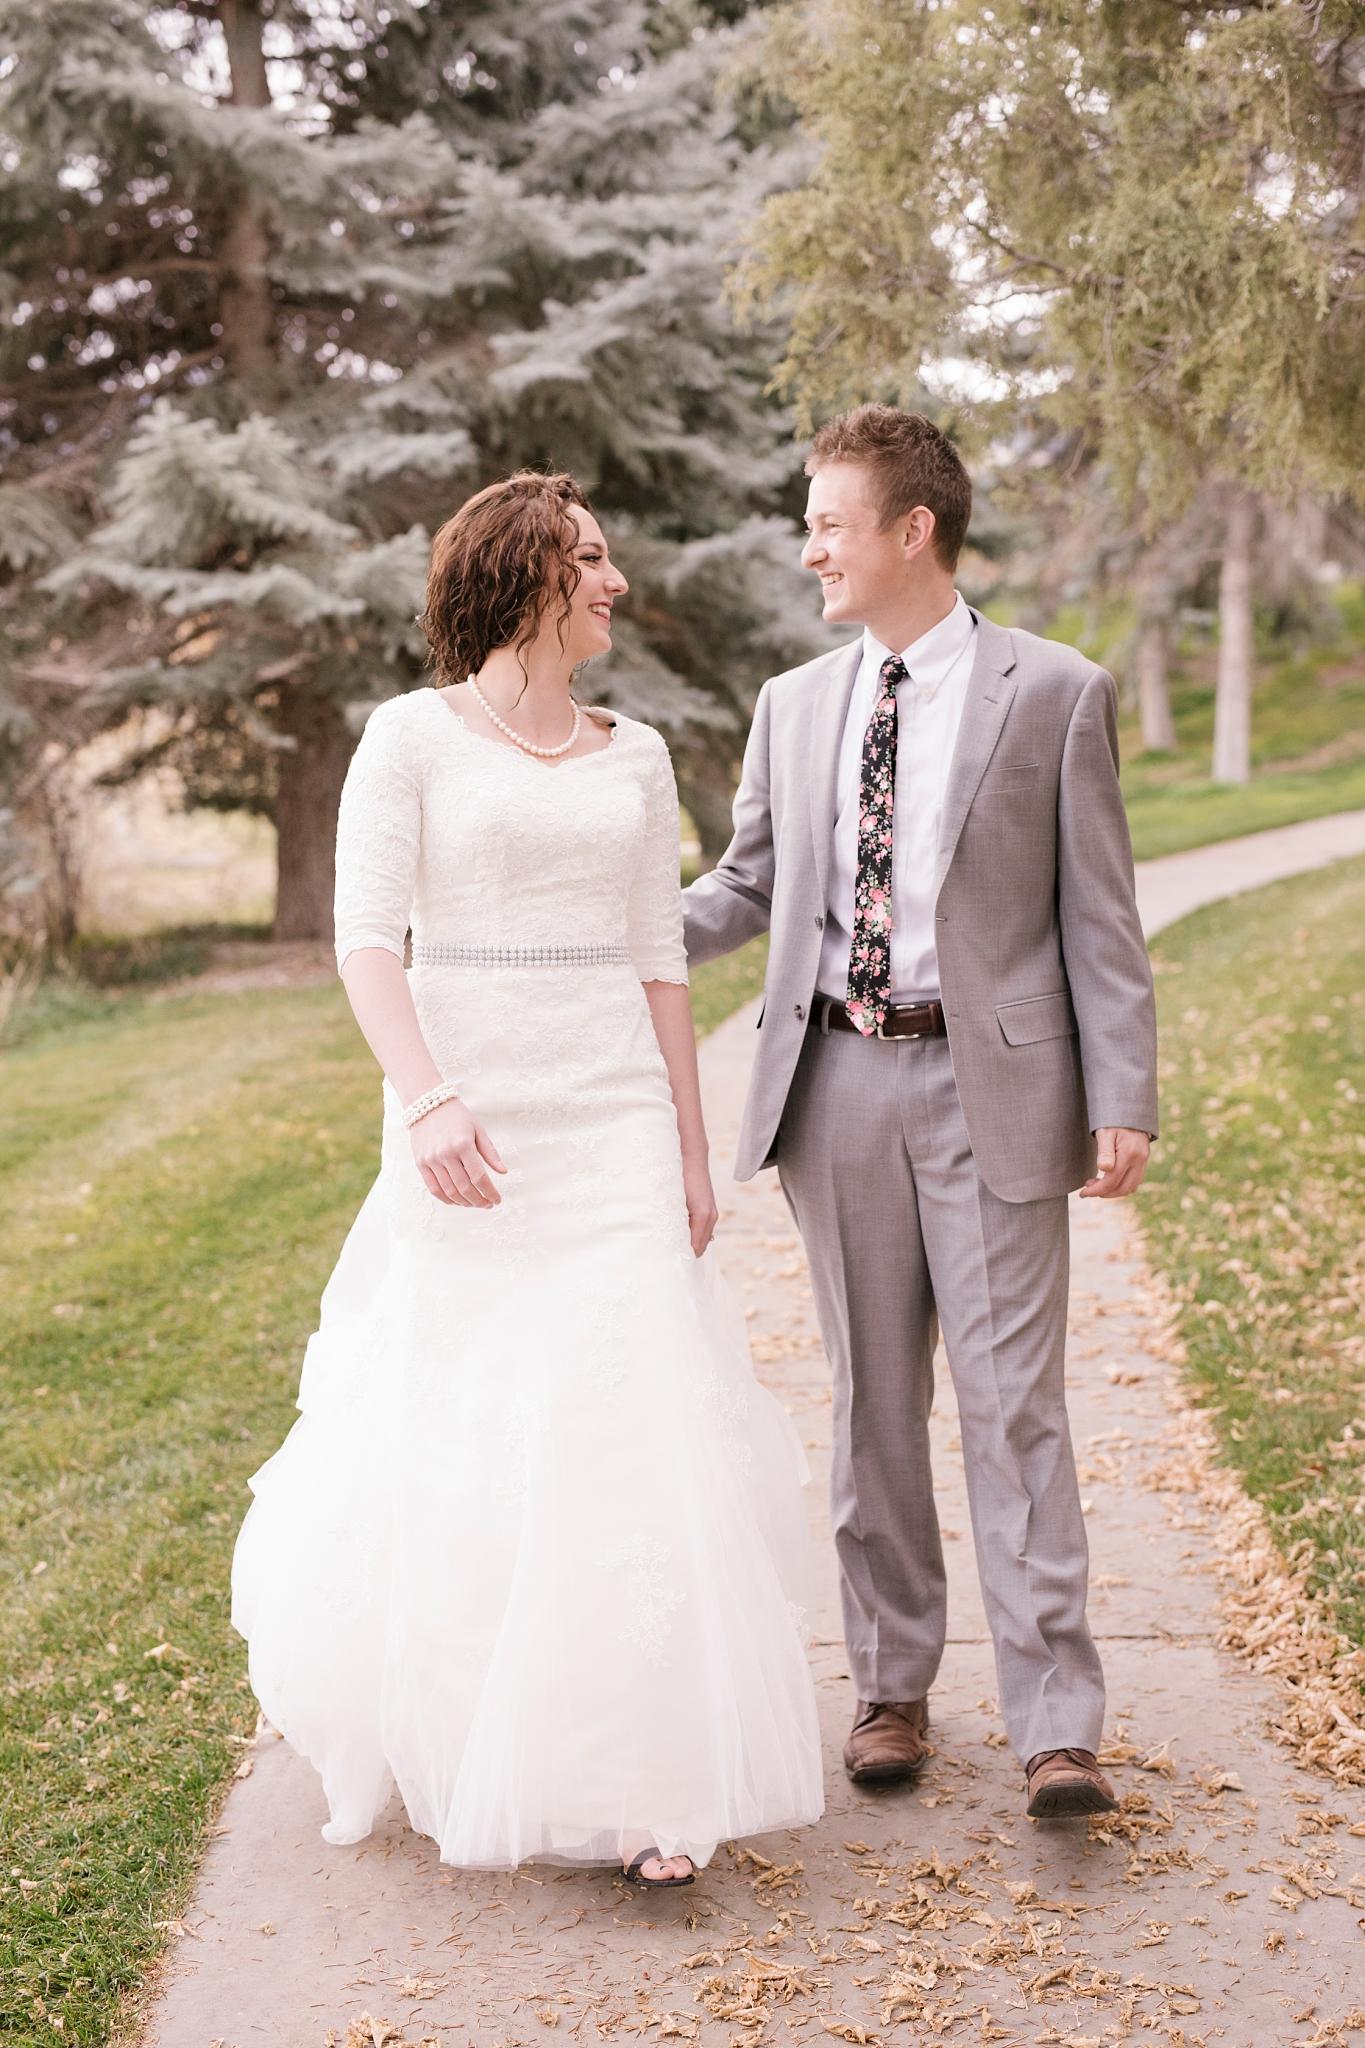 BA-Bridals-45_Lizzie-B-Imagery-Utah-Wedding-Photographer-Engagement-Photography-Salt-Lake-City-Park-City-Utah-County-Manti-Utah-Temple.jpg